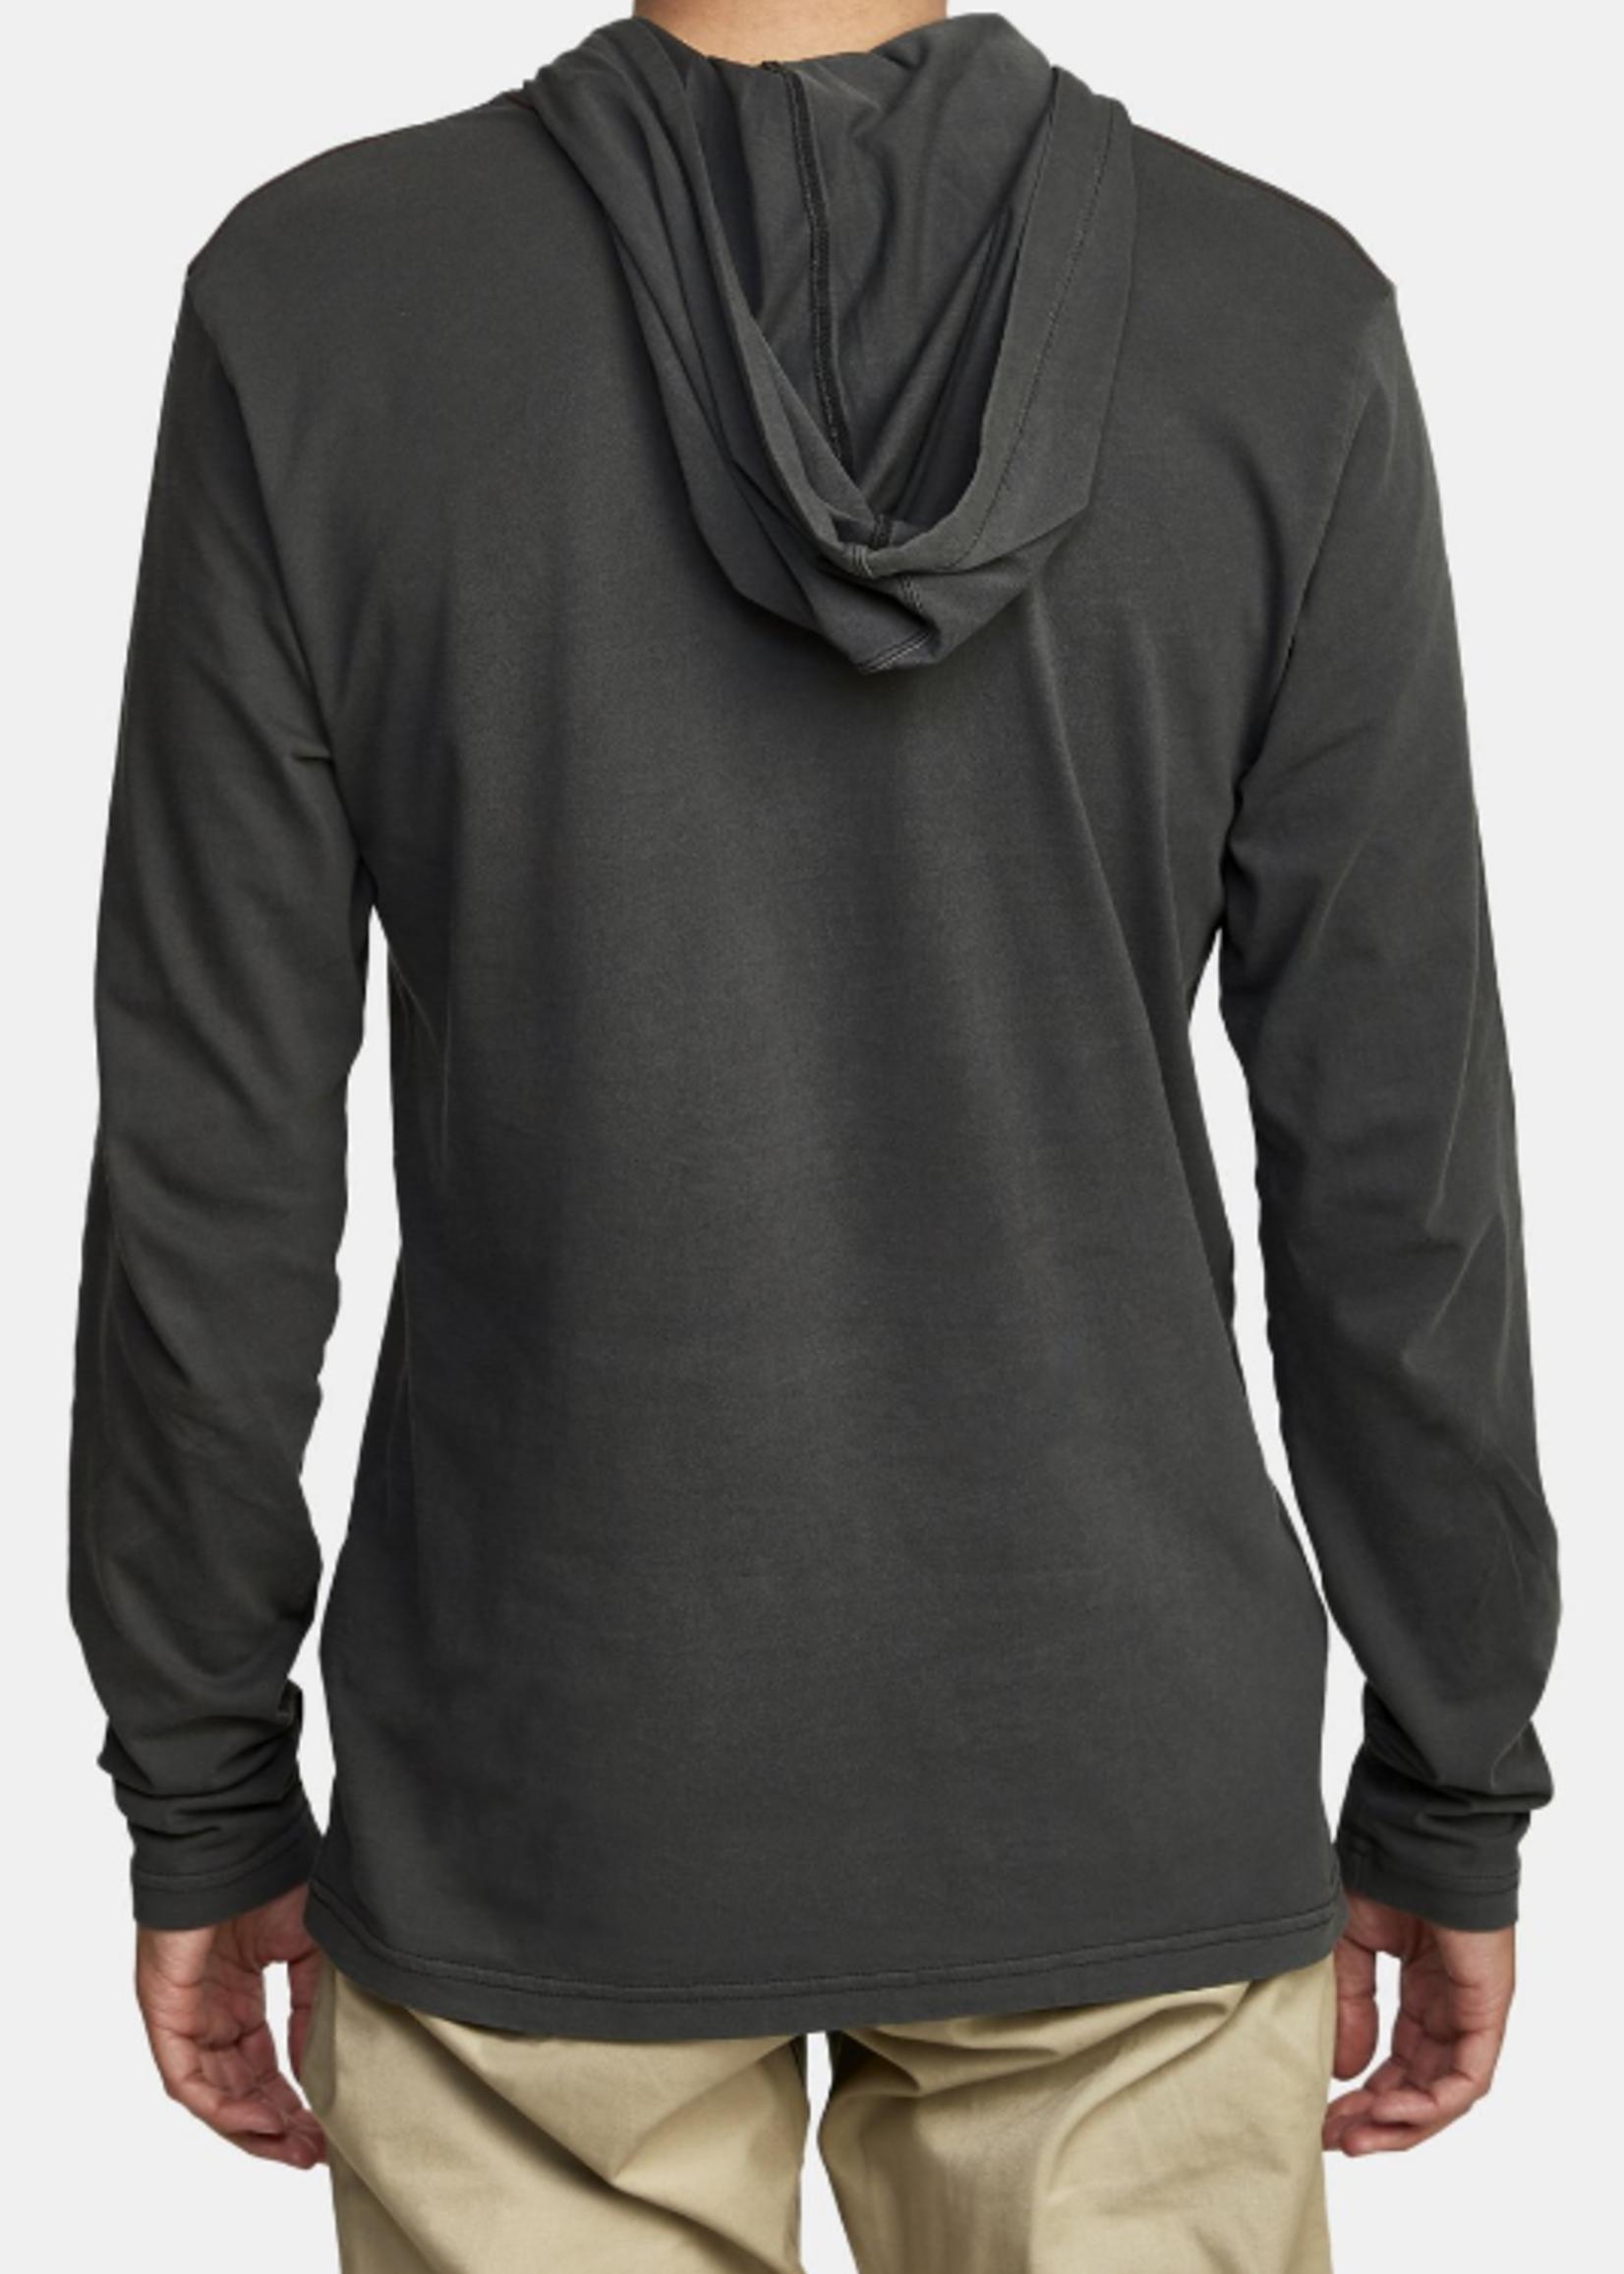 RVCA Pigment Hooded Tee - Black